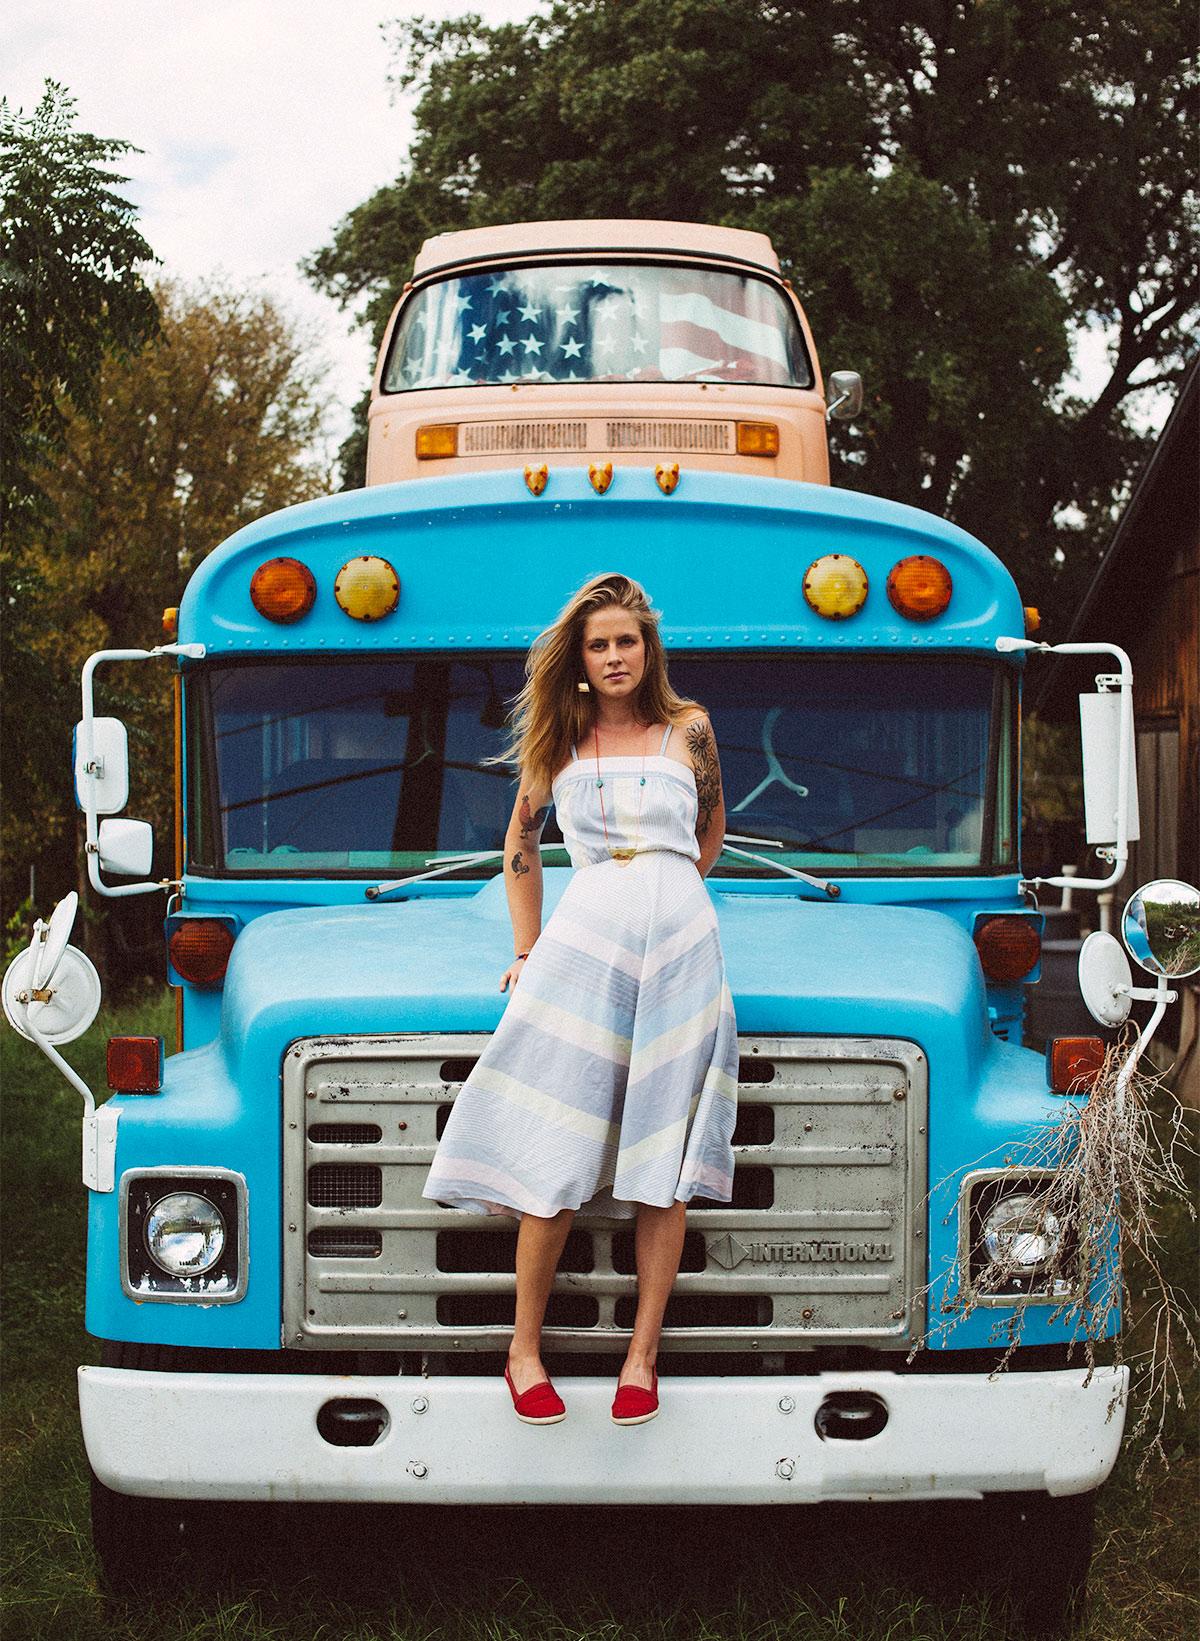 Girl on bus